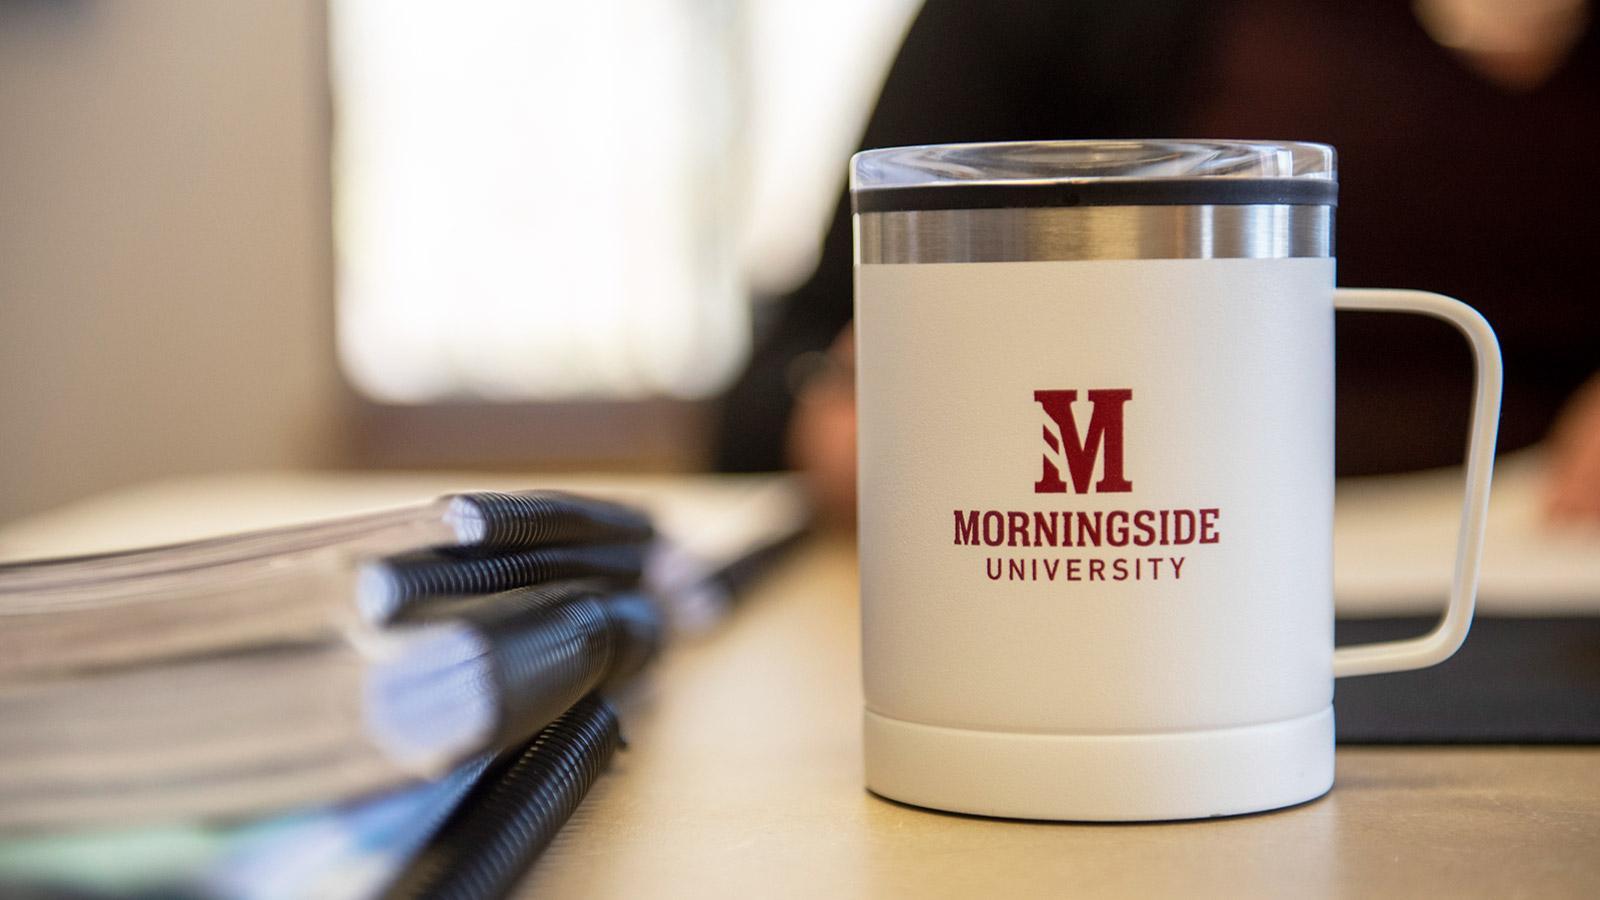 Morningside University coffee mug